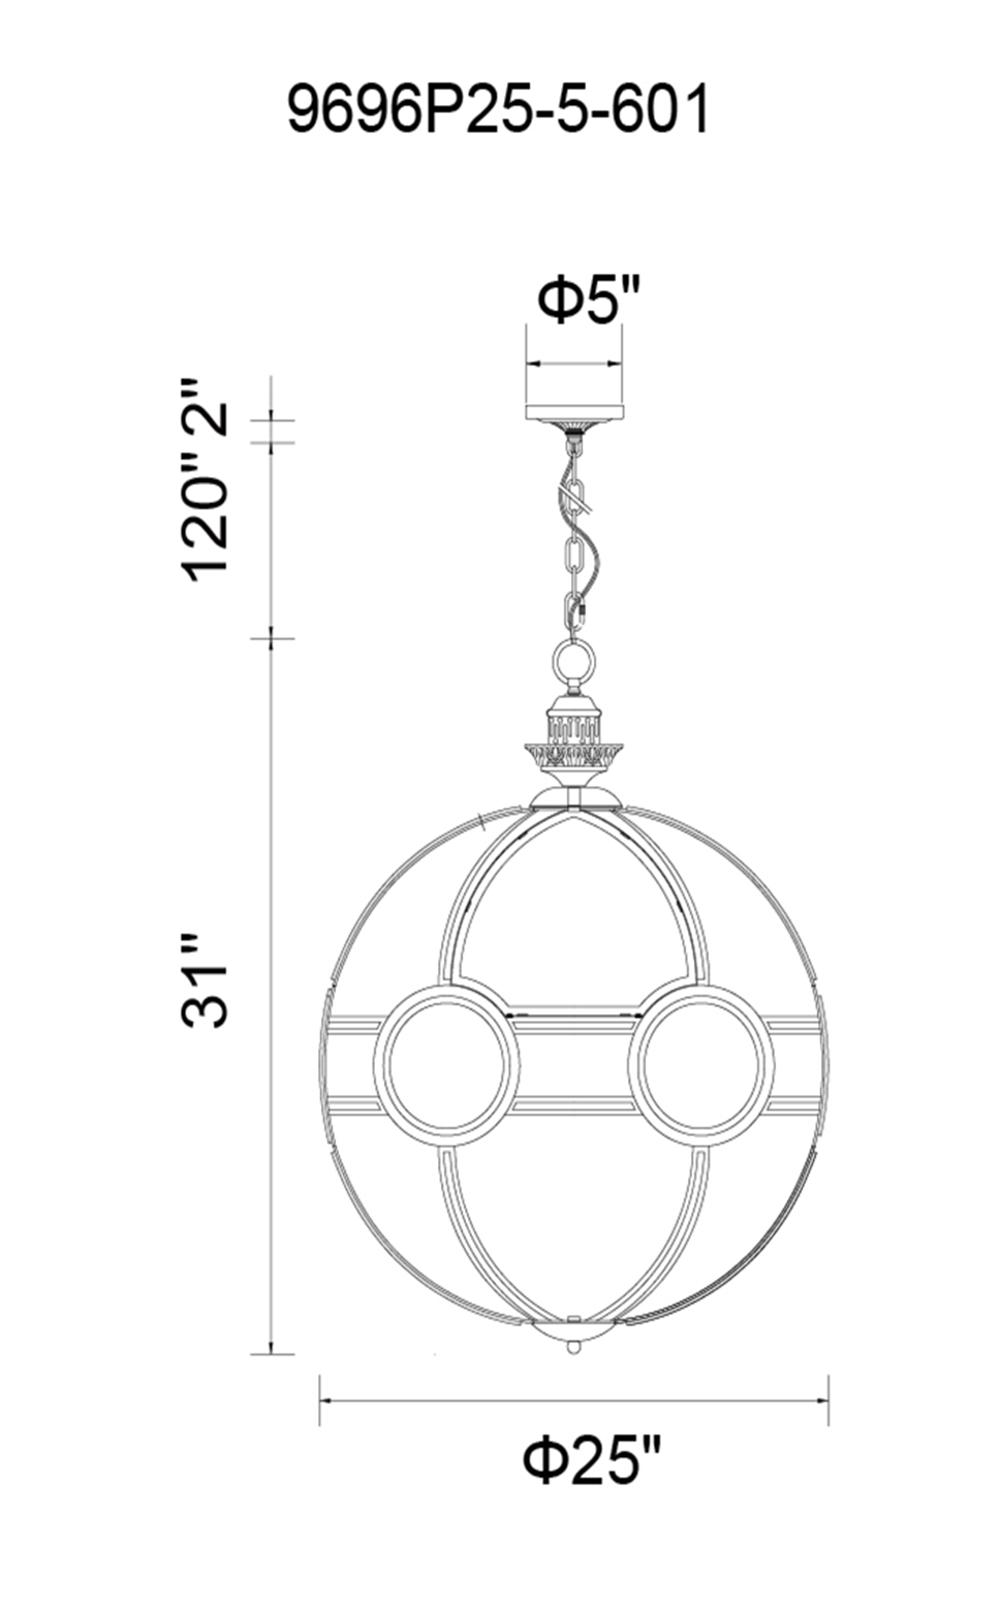 CWI Lighting Beas 5 Light Pendant With Chrome Finish Model: 9696P25-5-601 Line Drawing